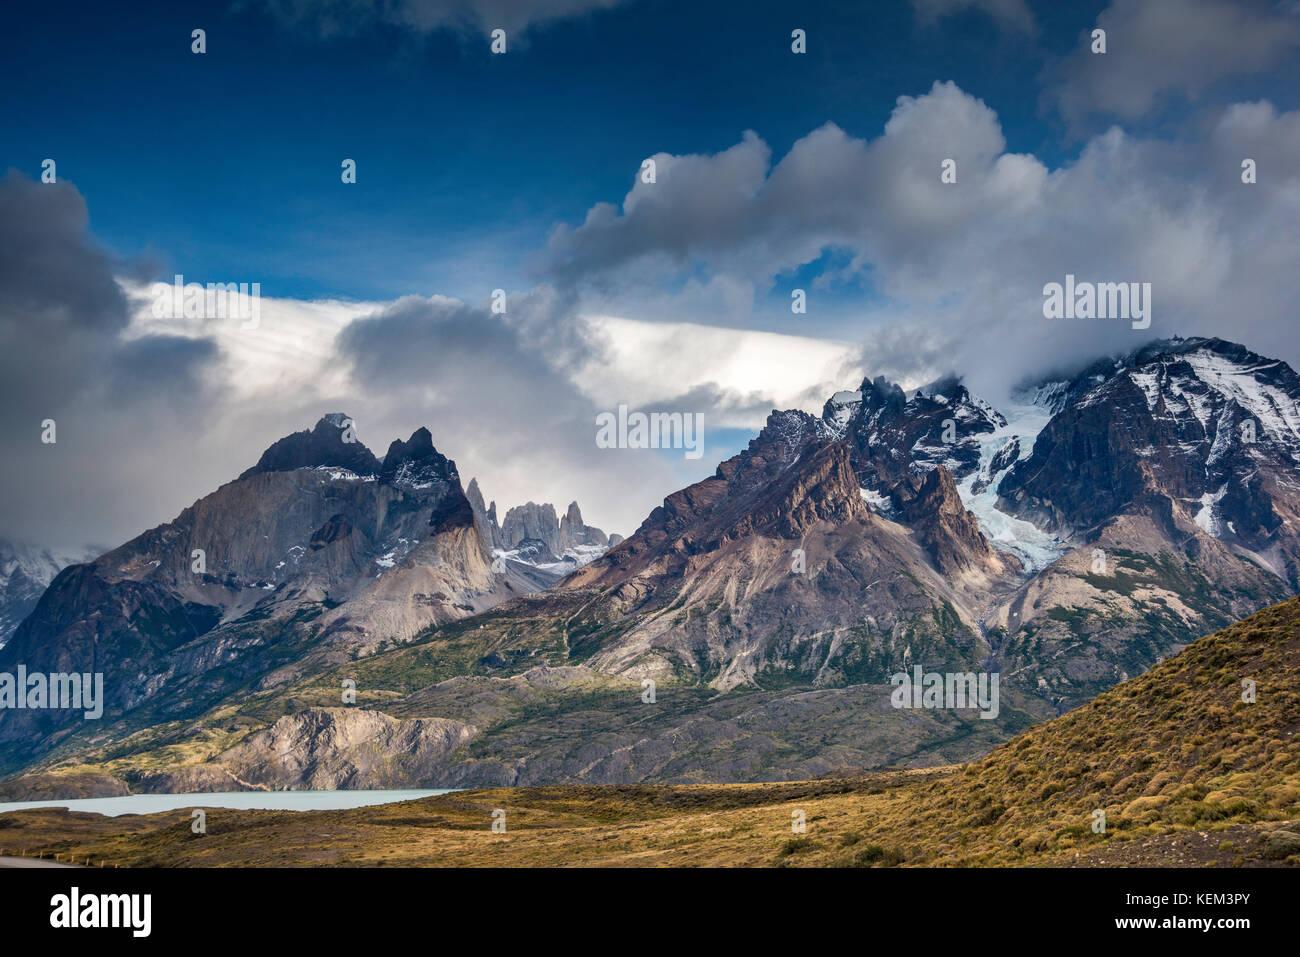 Cuernos del Paine, Monte Almirante Nieto, Torre Central in far distance, Lago Nordenskjold, Torres del Paine National - Stock Image